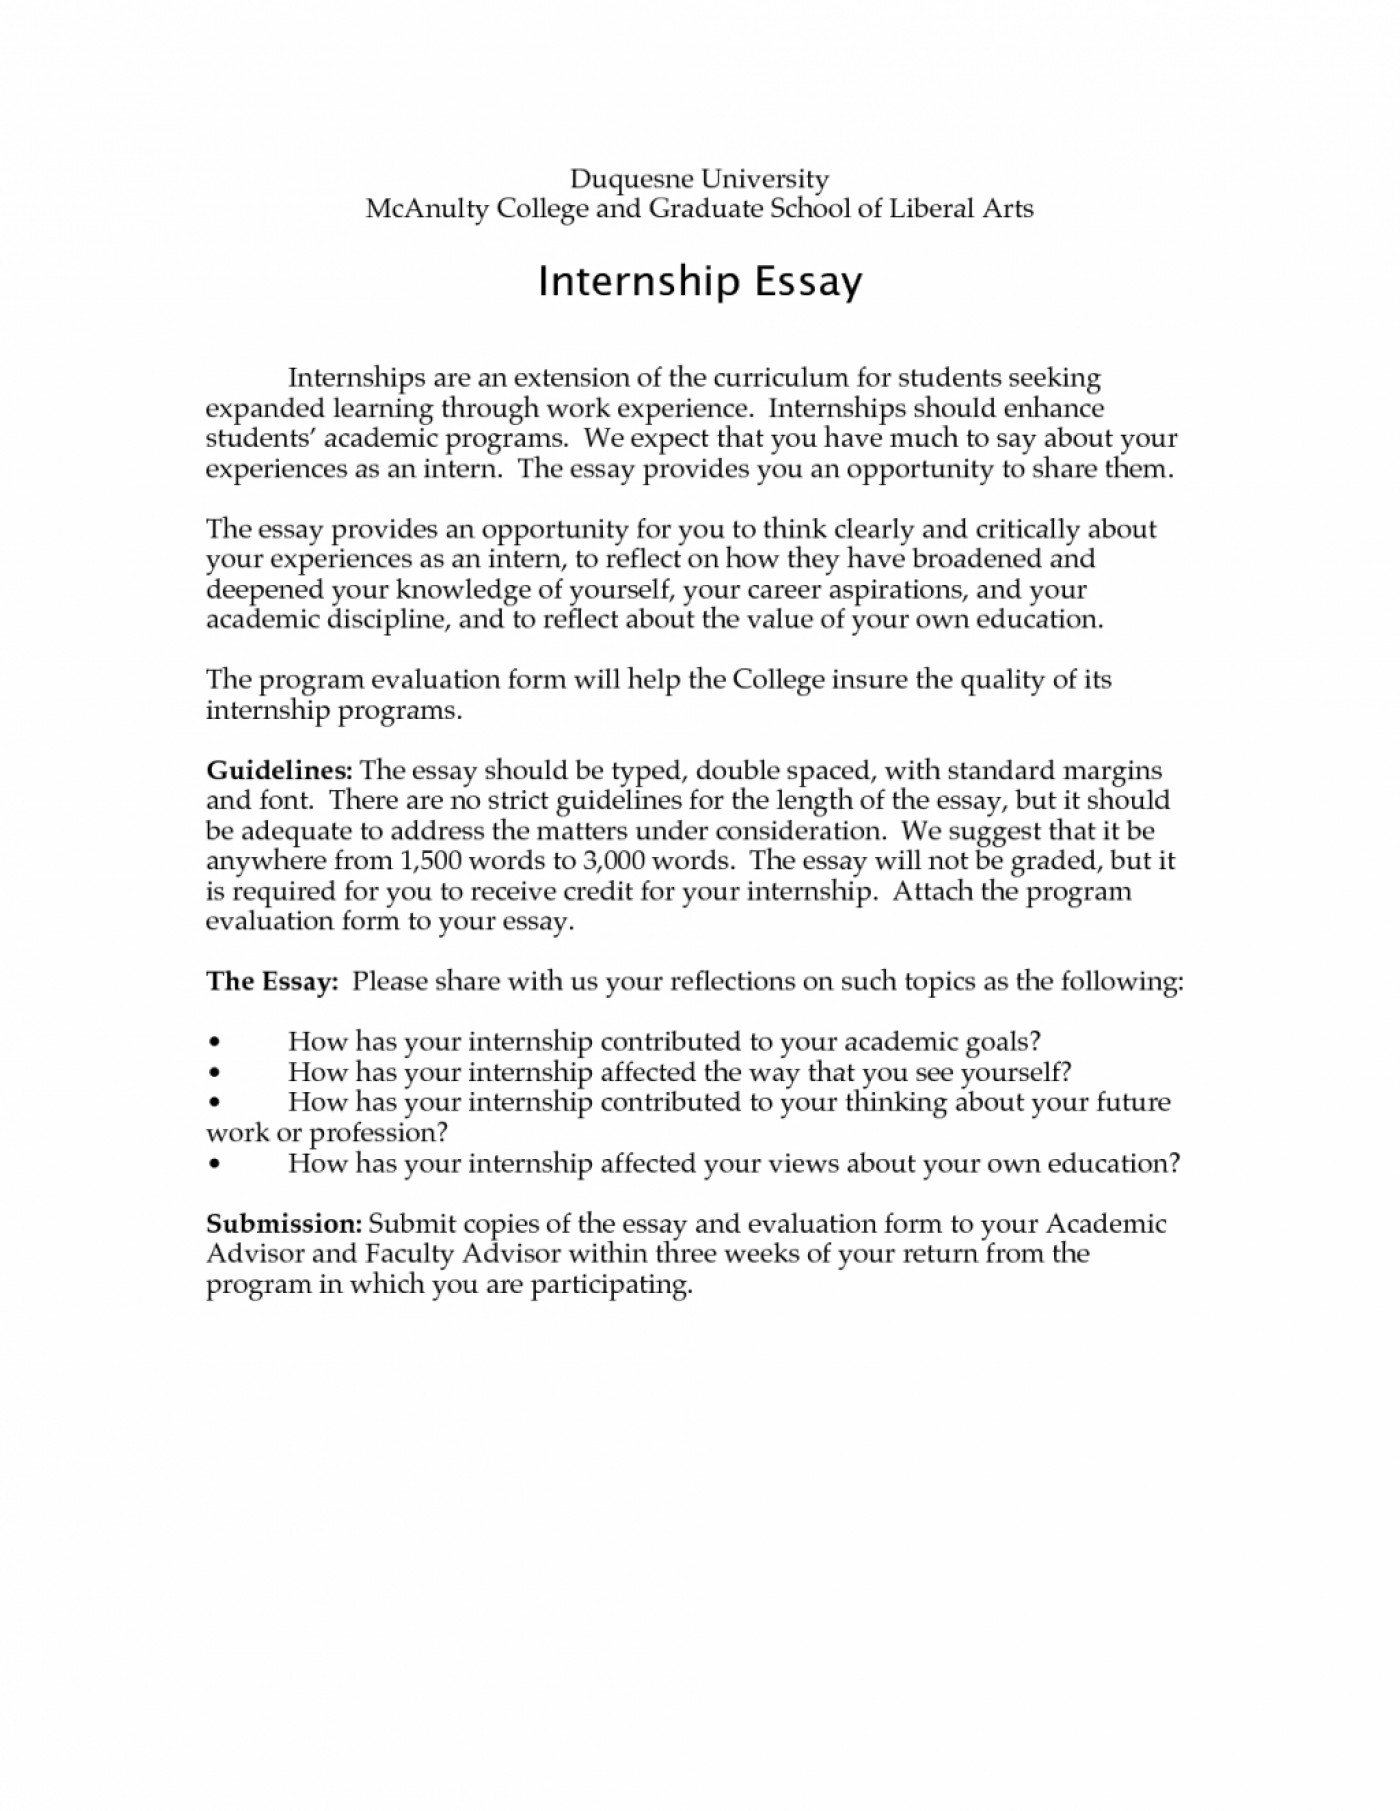 hacu internship essay sample